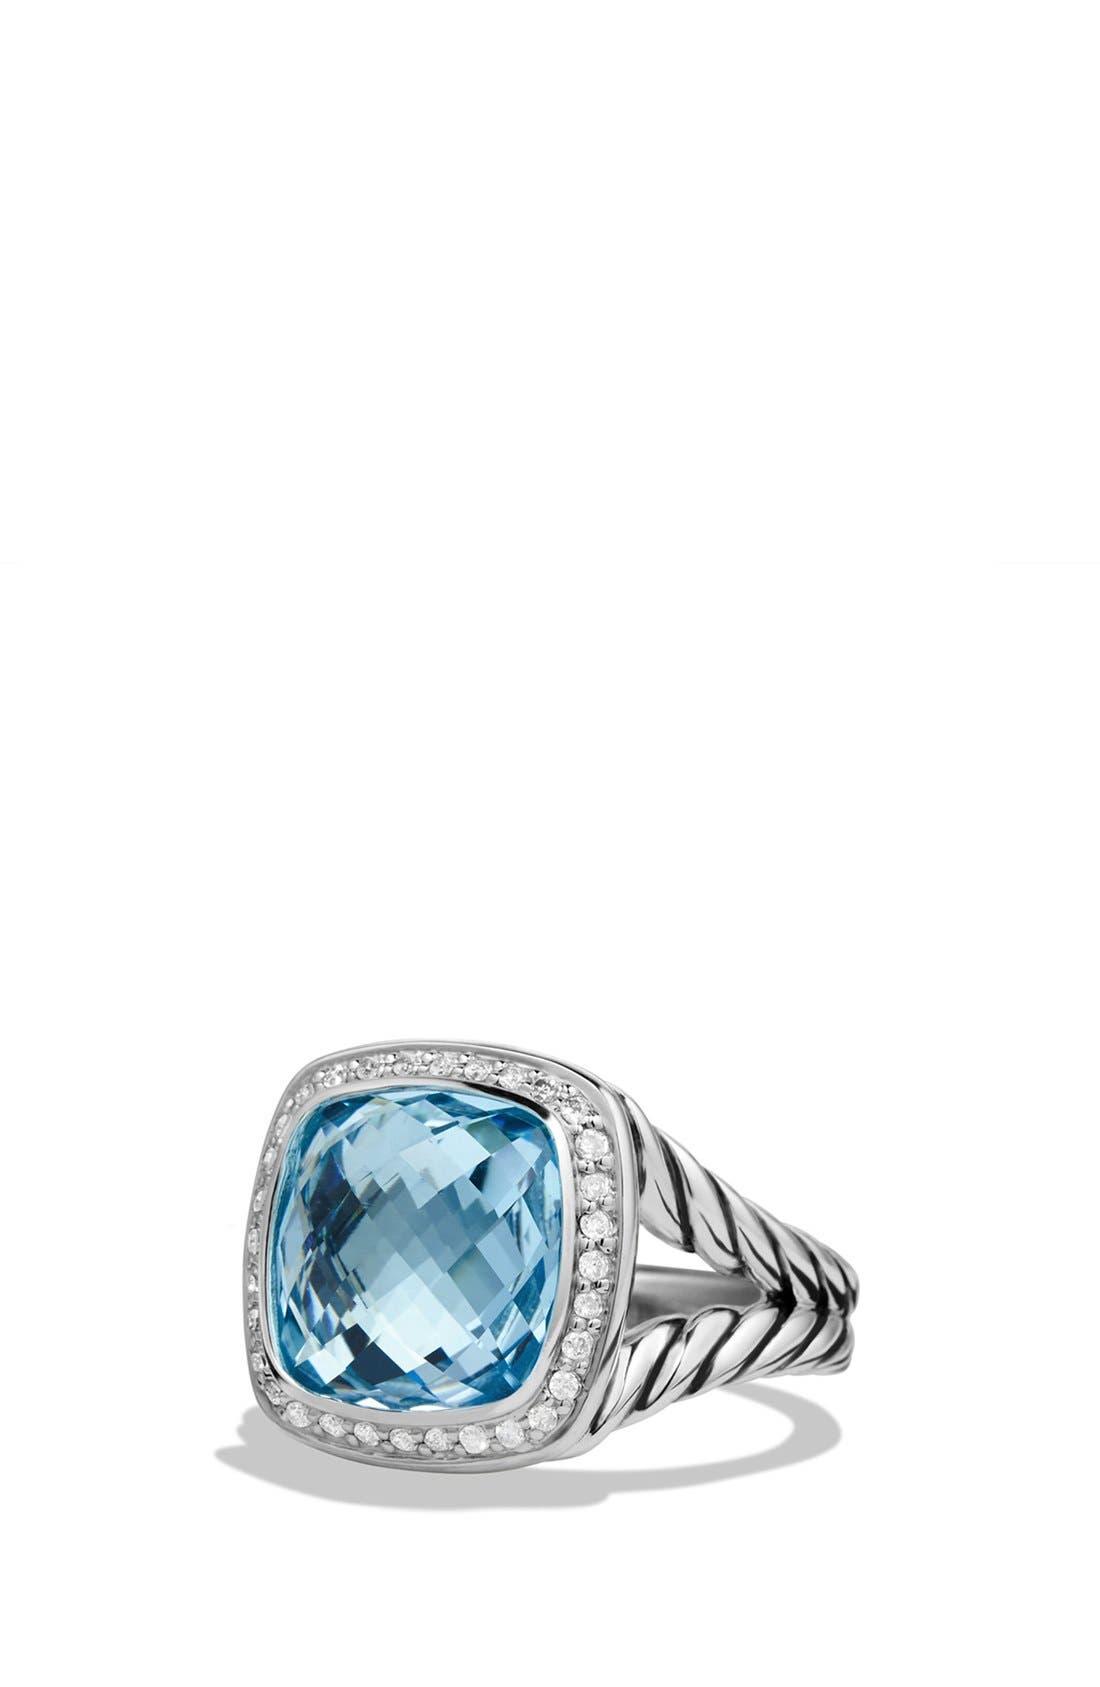 Alternate Image 1 Selected - David Yurman'Albion' Ring with Semiprecious Stone and Diamonds